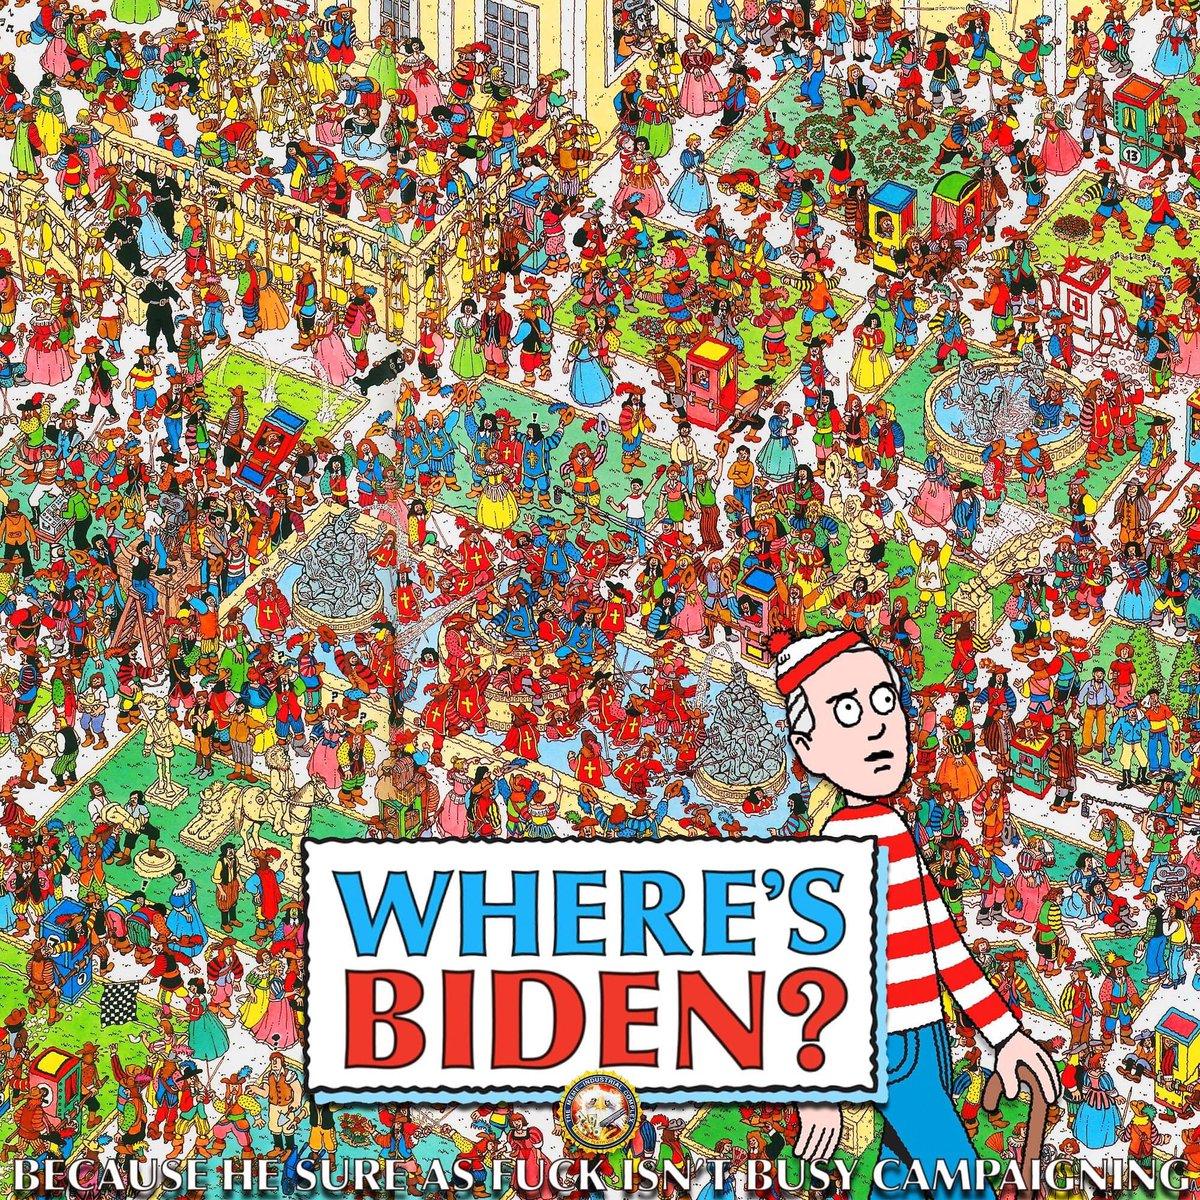 Find Biden for a nice surprise!  Image is not owned by us :) #NotMeUs #JoeBidenIsARacist #NeverBiden #JoeBiden https://t.co/AYr8A0kXpY